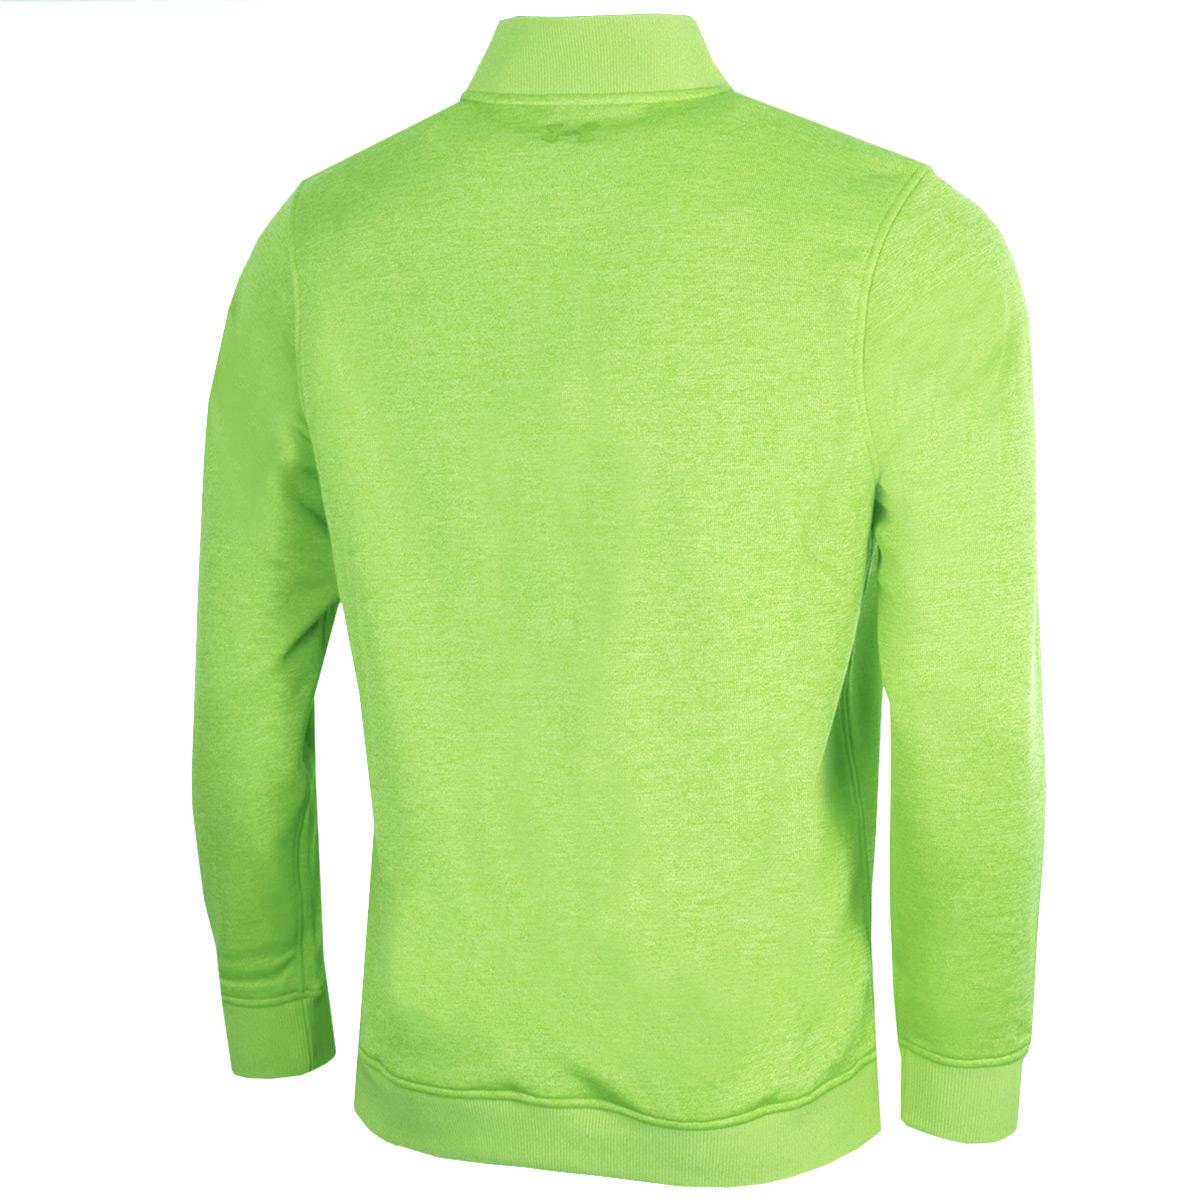 Under-Armour-Mens-UA-Storm-Sweater-Fleece-1-4-Zip-Pullover-Jumper-25-OFF-RRP thumbnail 18